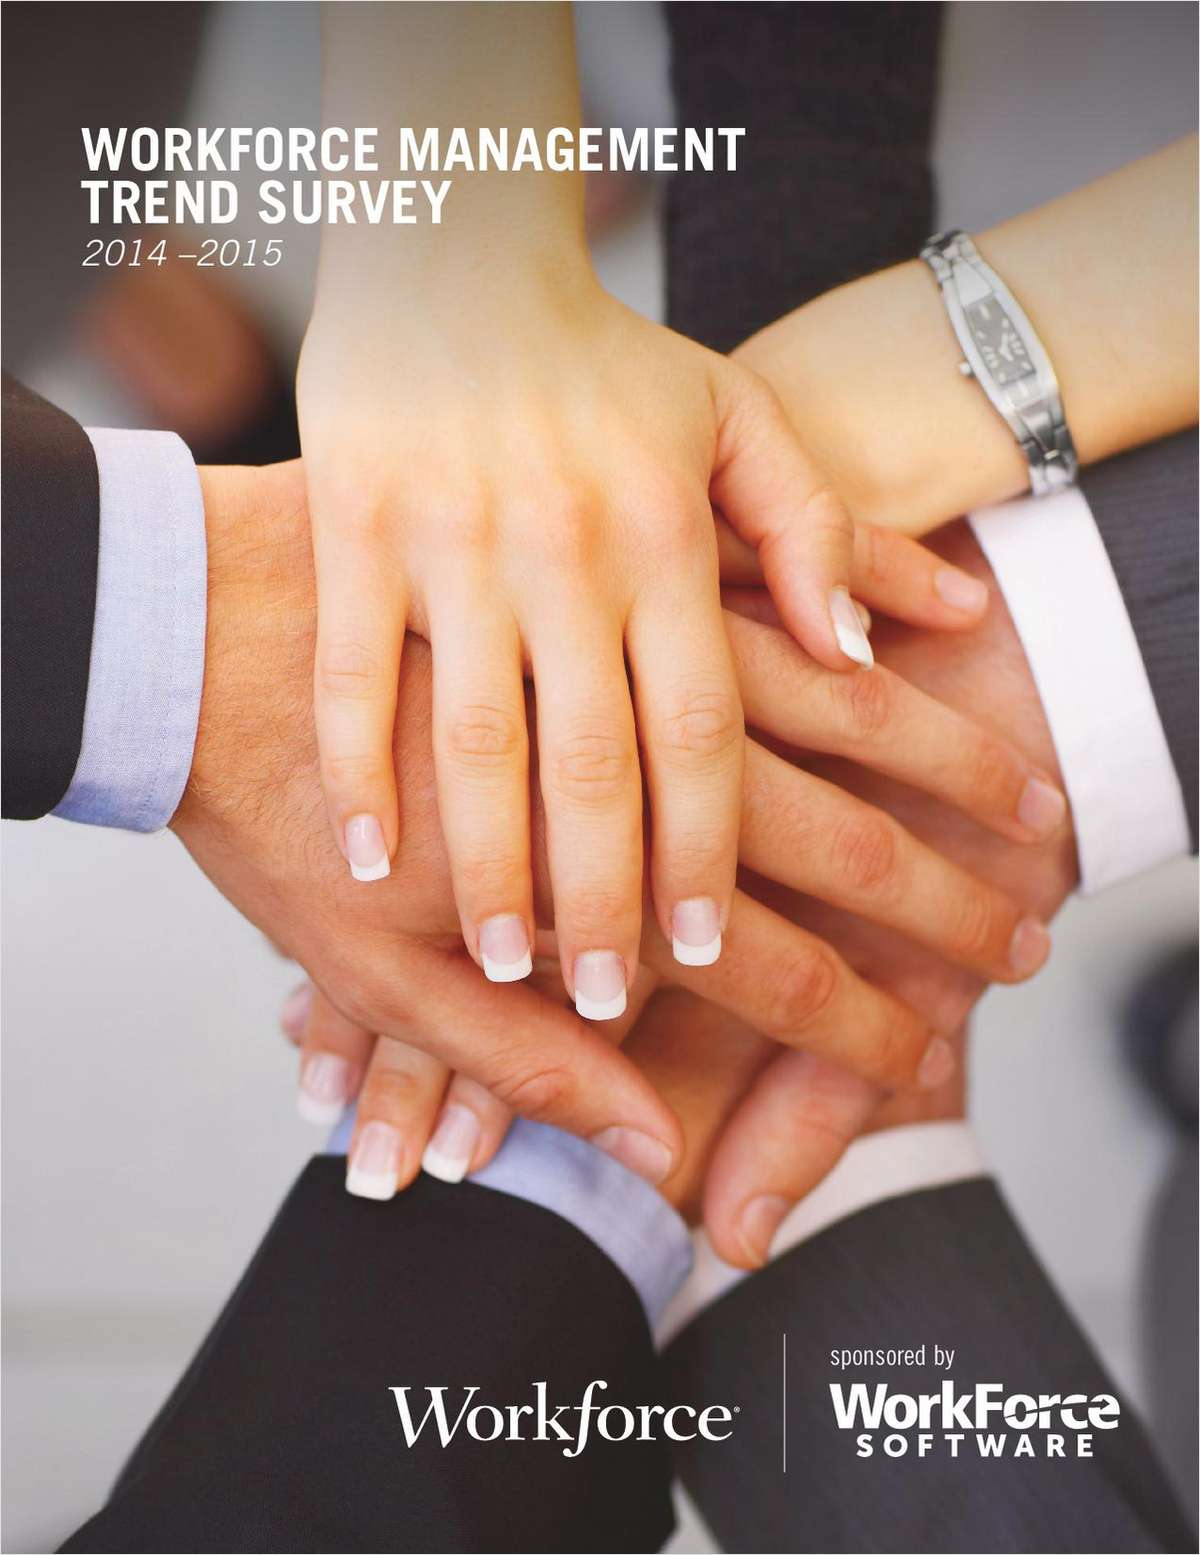 Workforce Management Trends Report 2014 - 2015